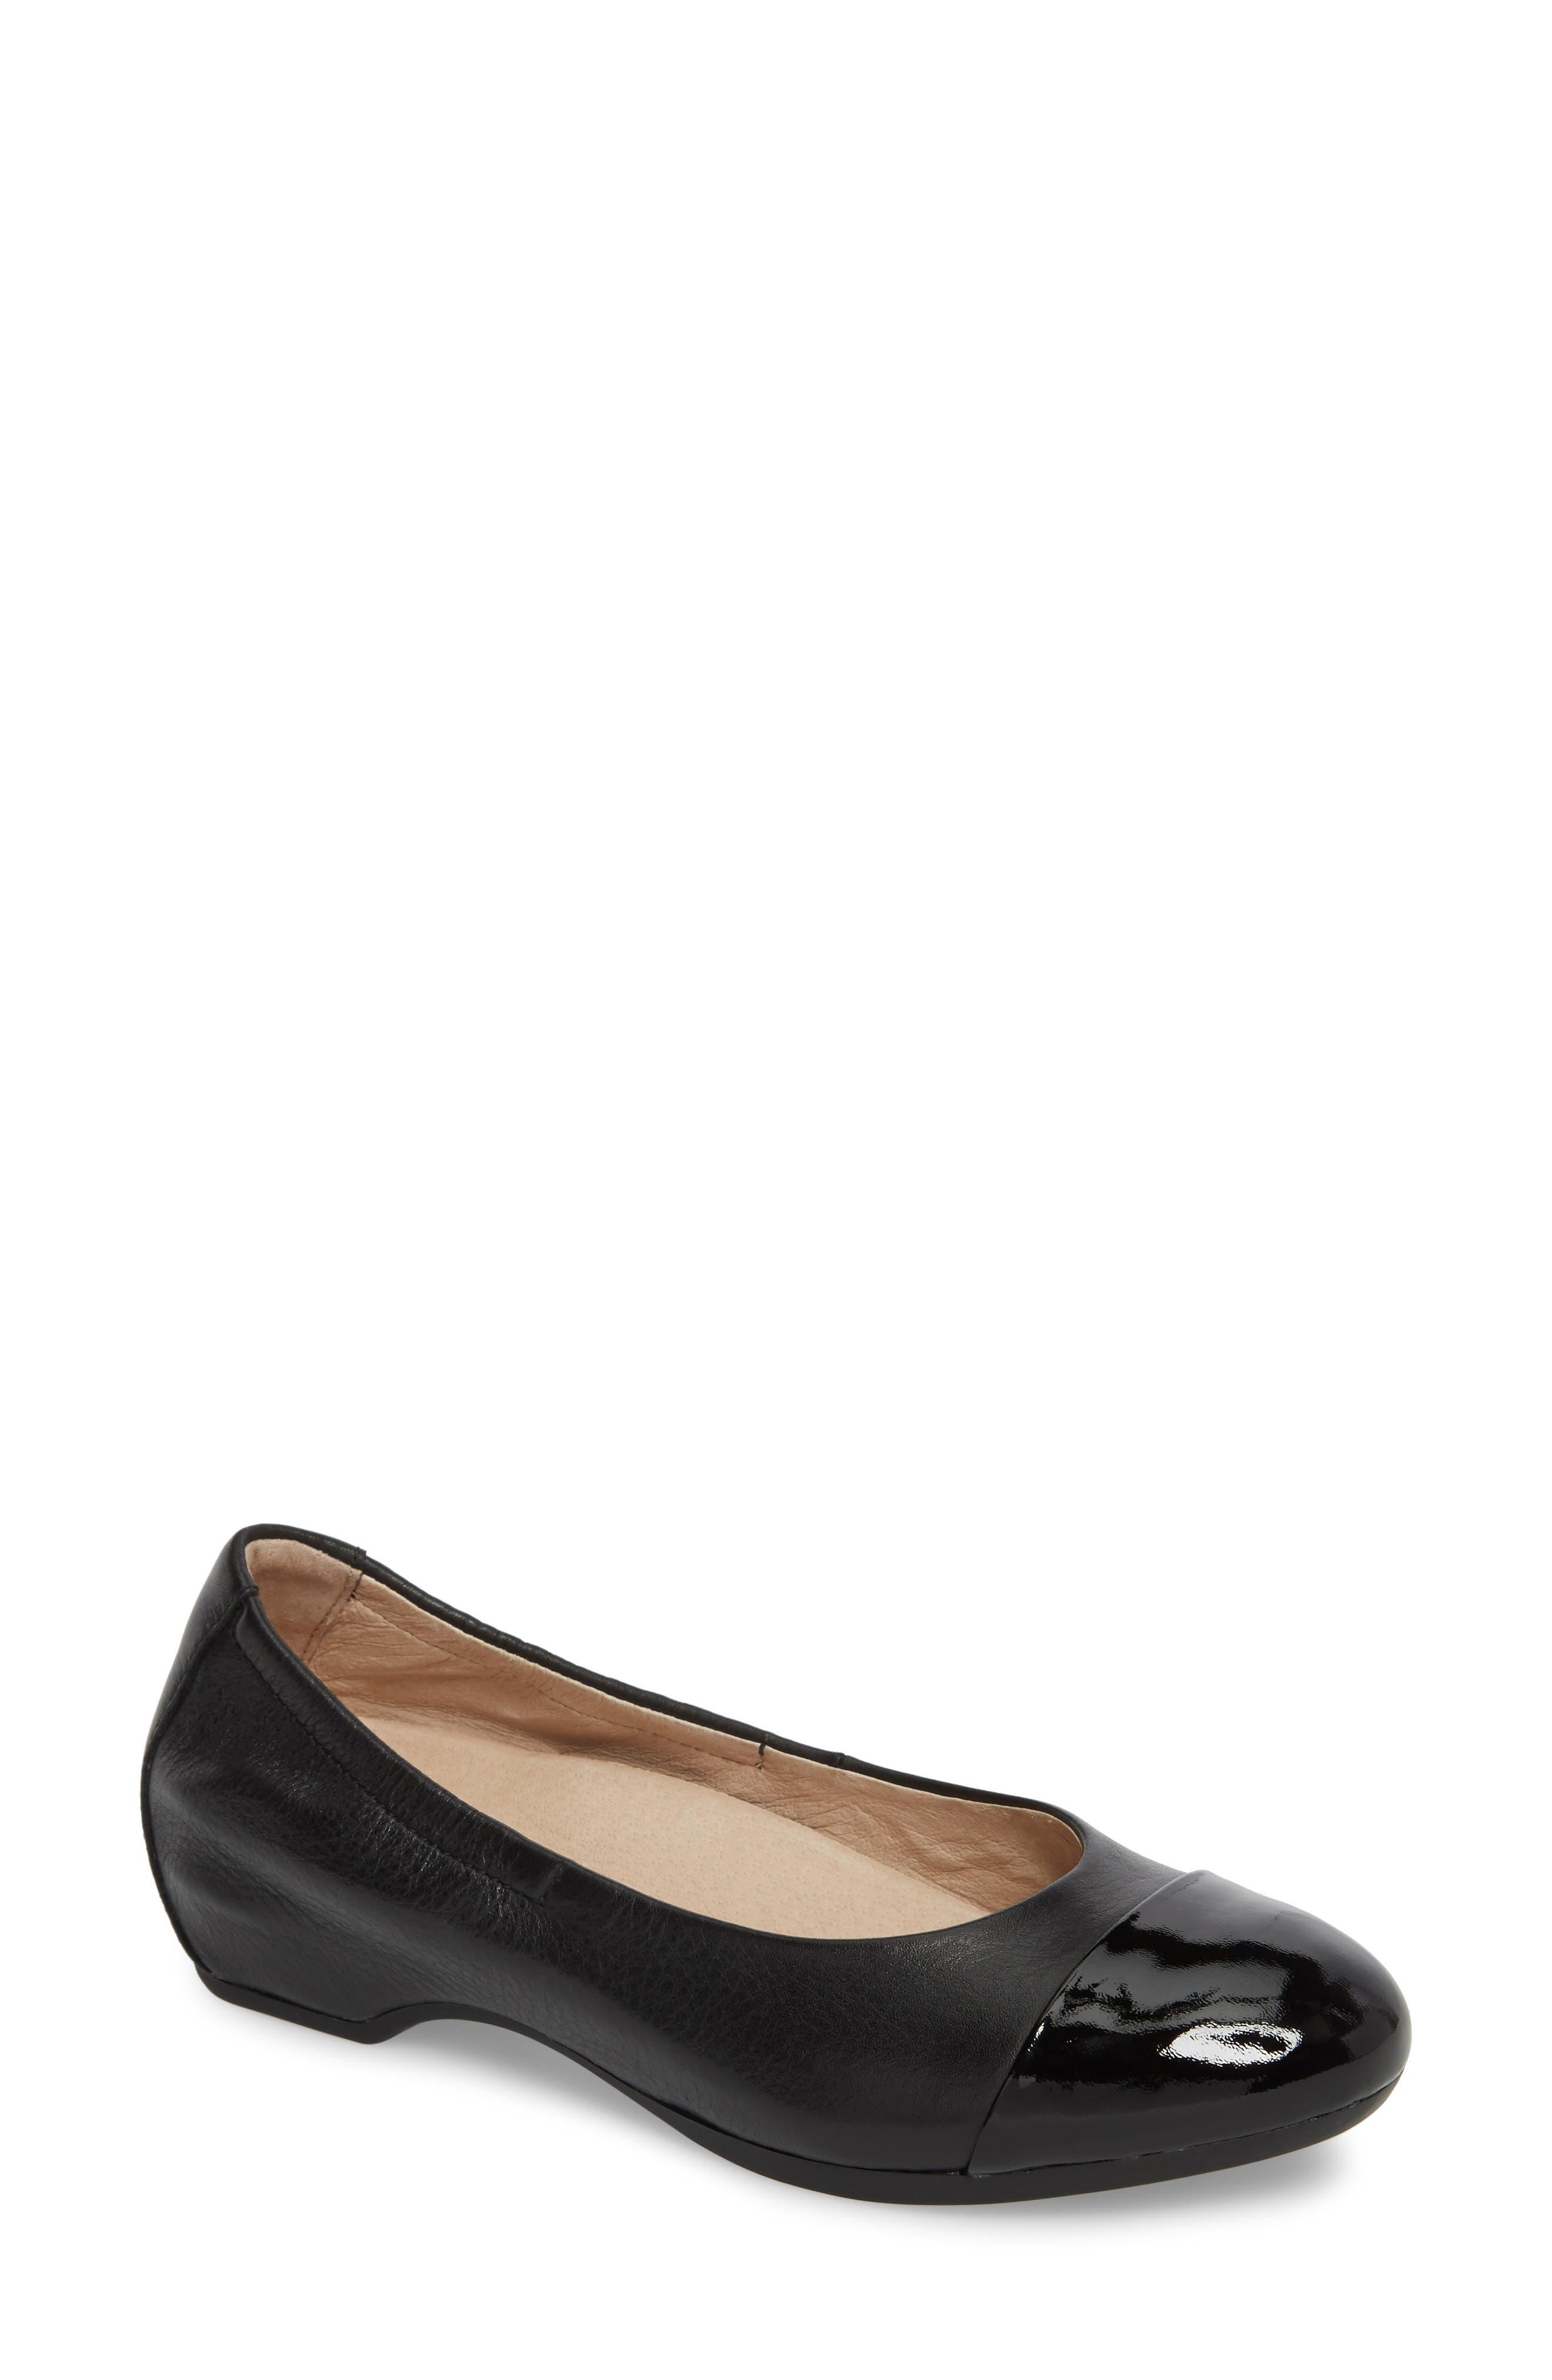 Lisanne Flat,                         Main,                         color, BLACK LEATHER